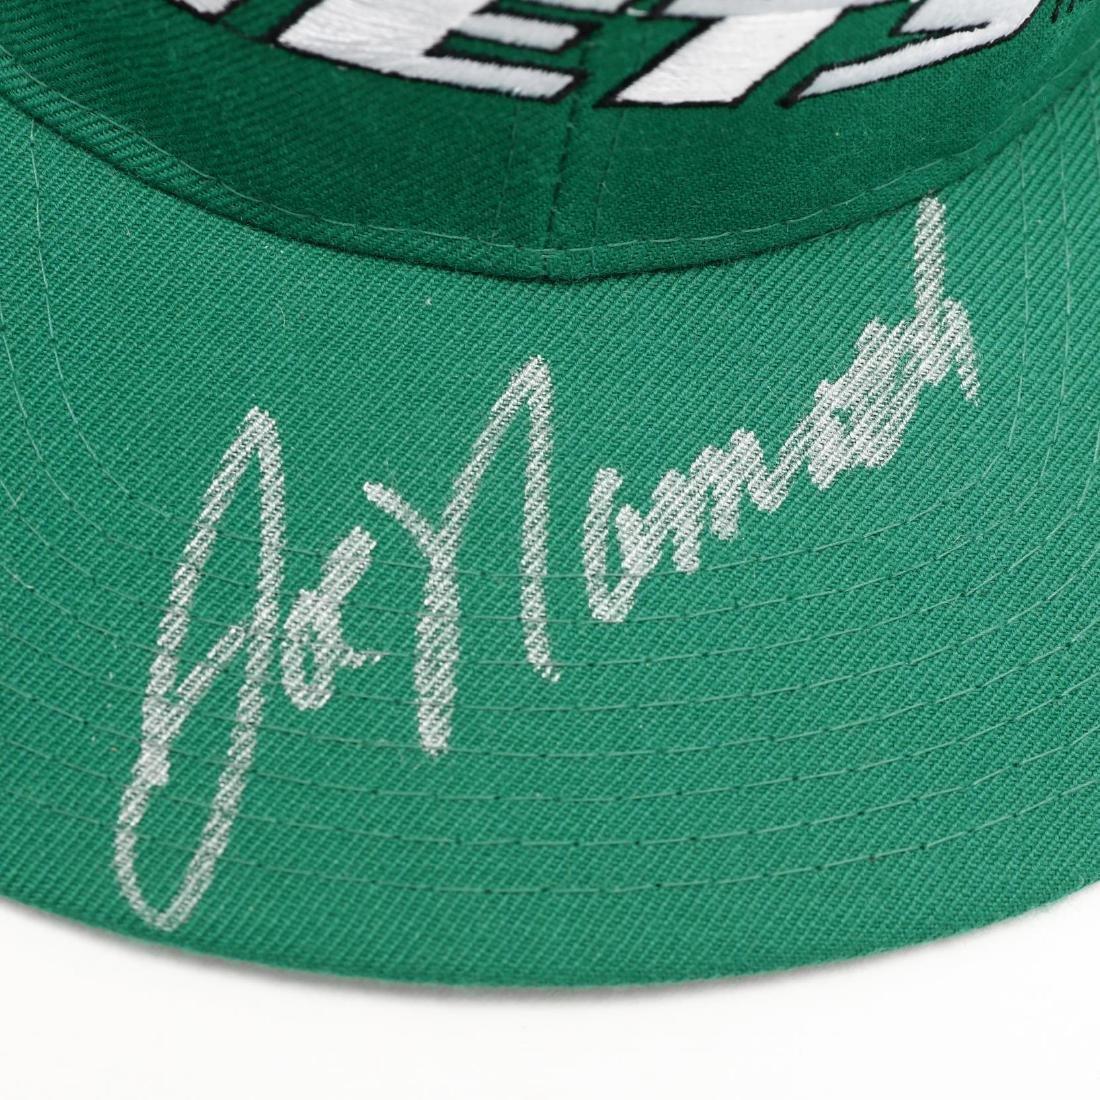 Joe Namath Autographed New York Jets Cap with COA - 2